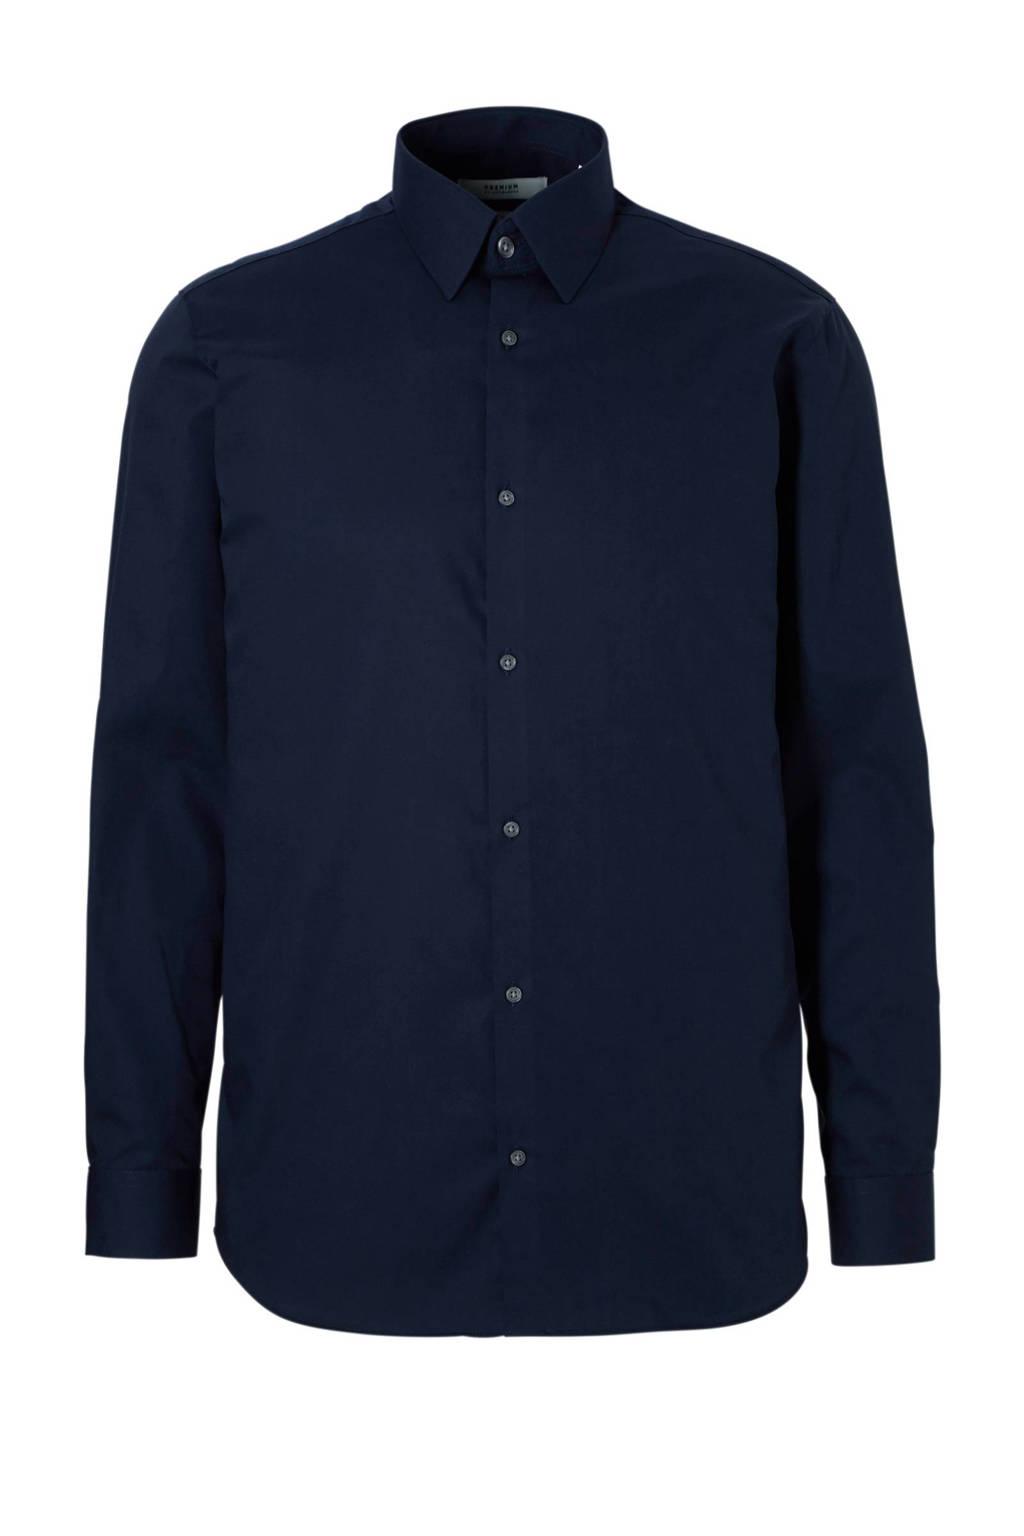 JACK & JONES PREMIUM slim fit overhemd, Donkerblauw